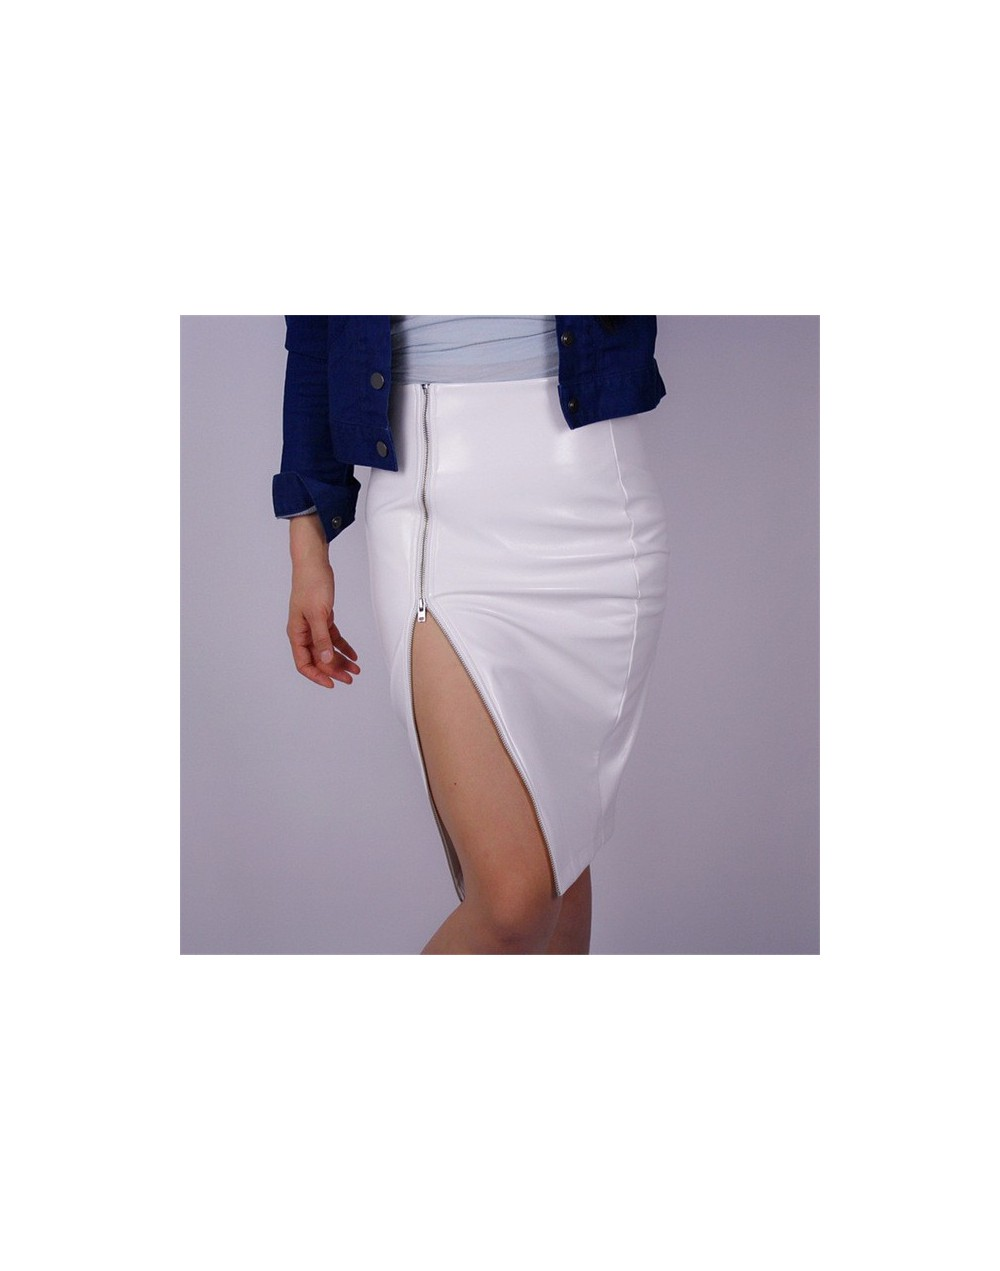 Red Patent Leather Long Zipper PU Imitation Leather Skirts Side Split Half-length Pencil Half Skirt High Waist Elastic VG03 ...